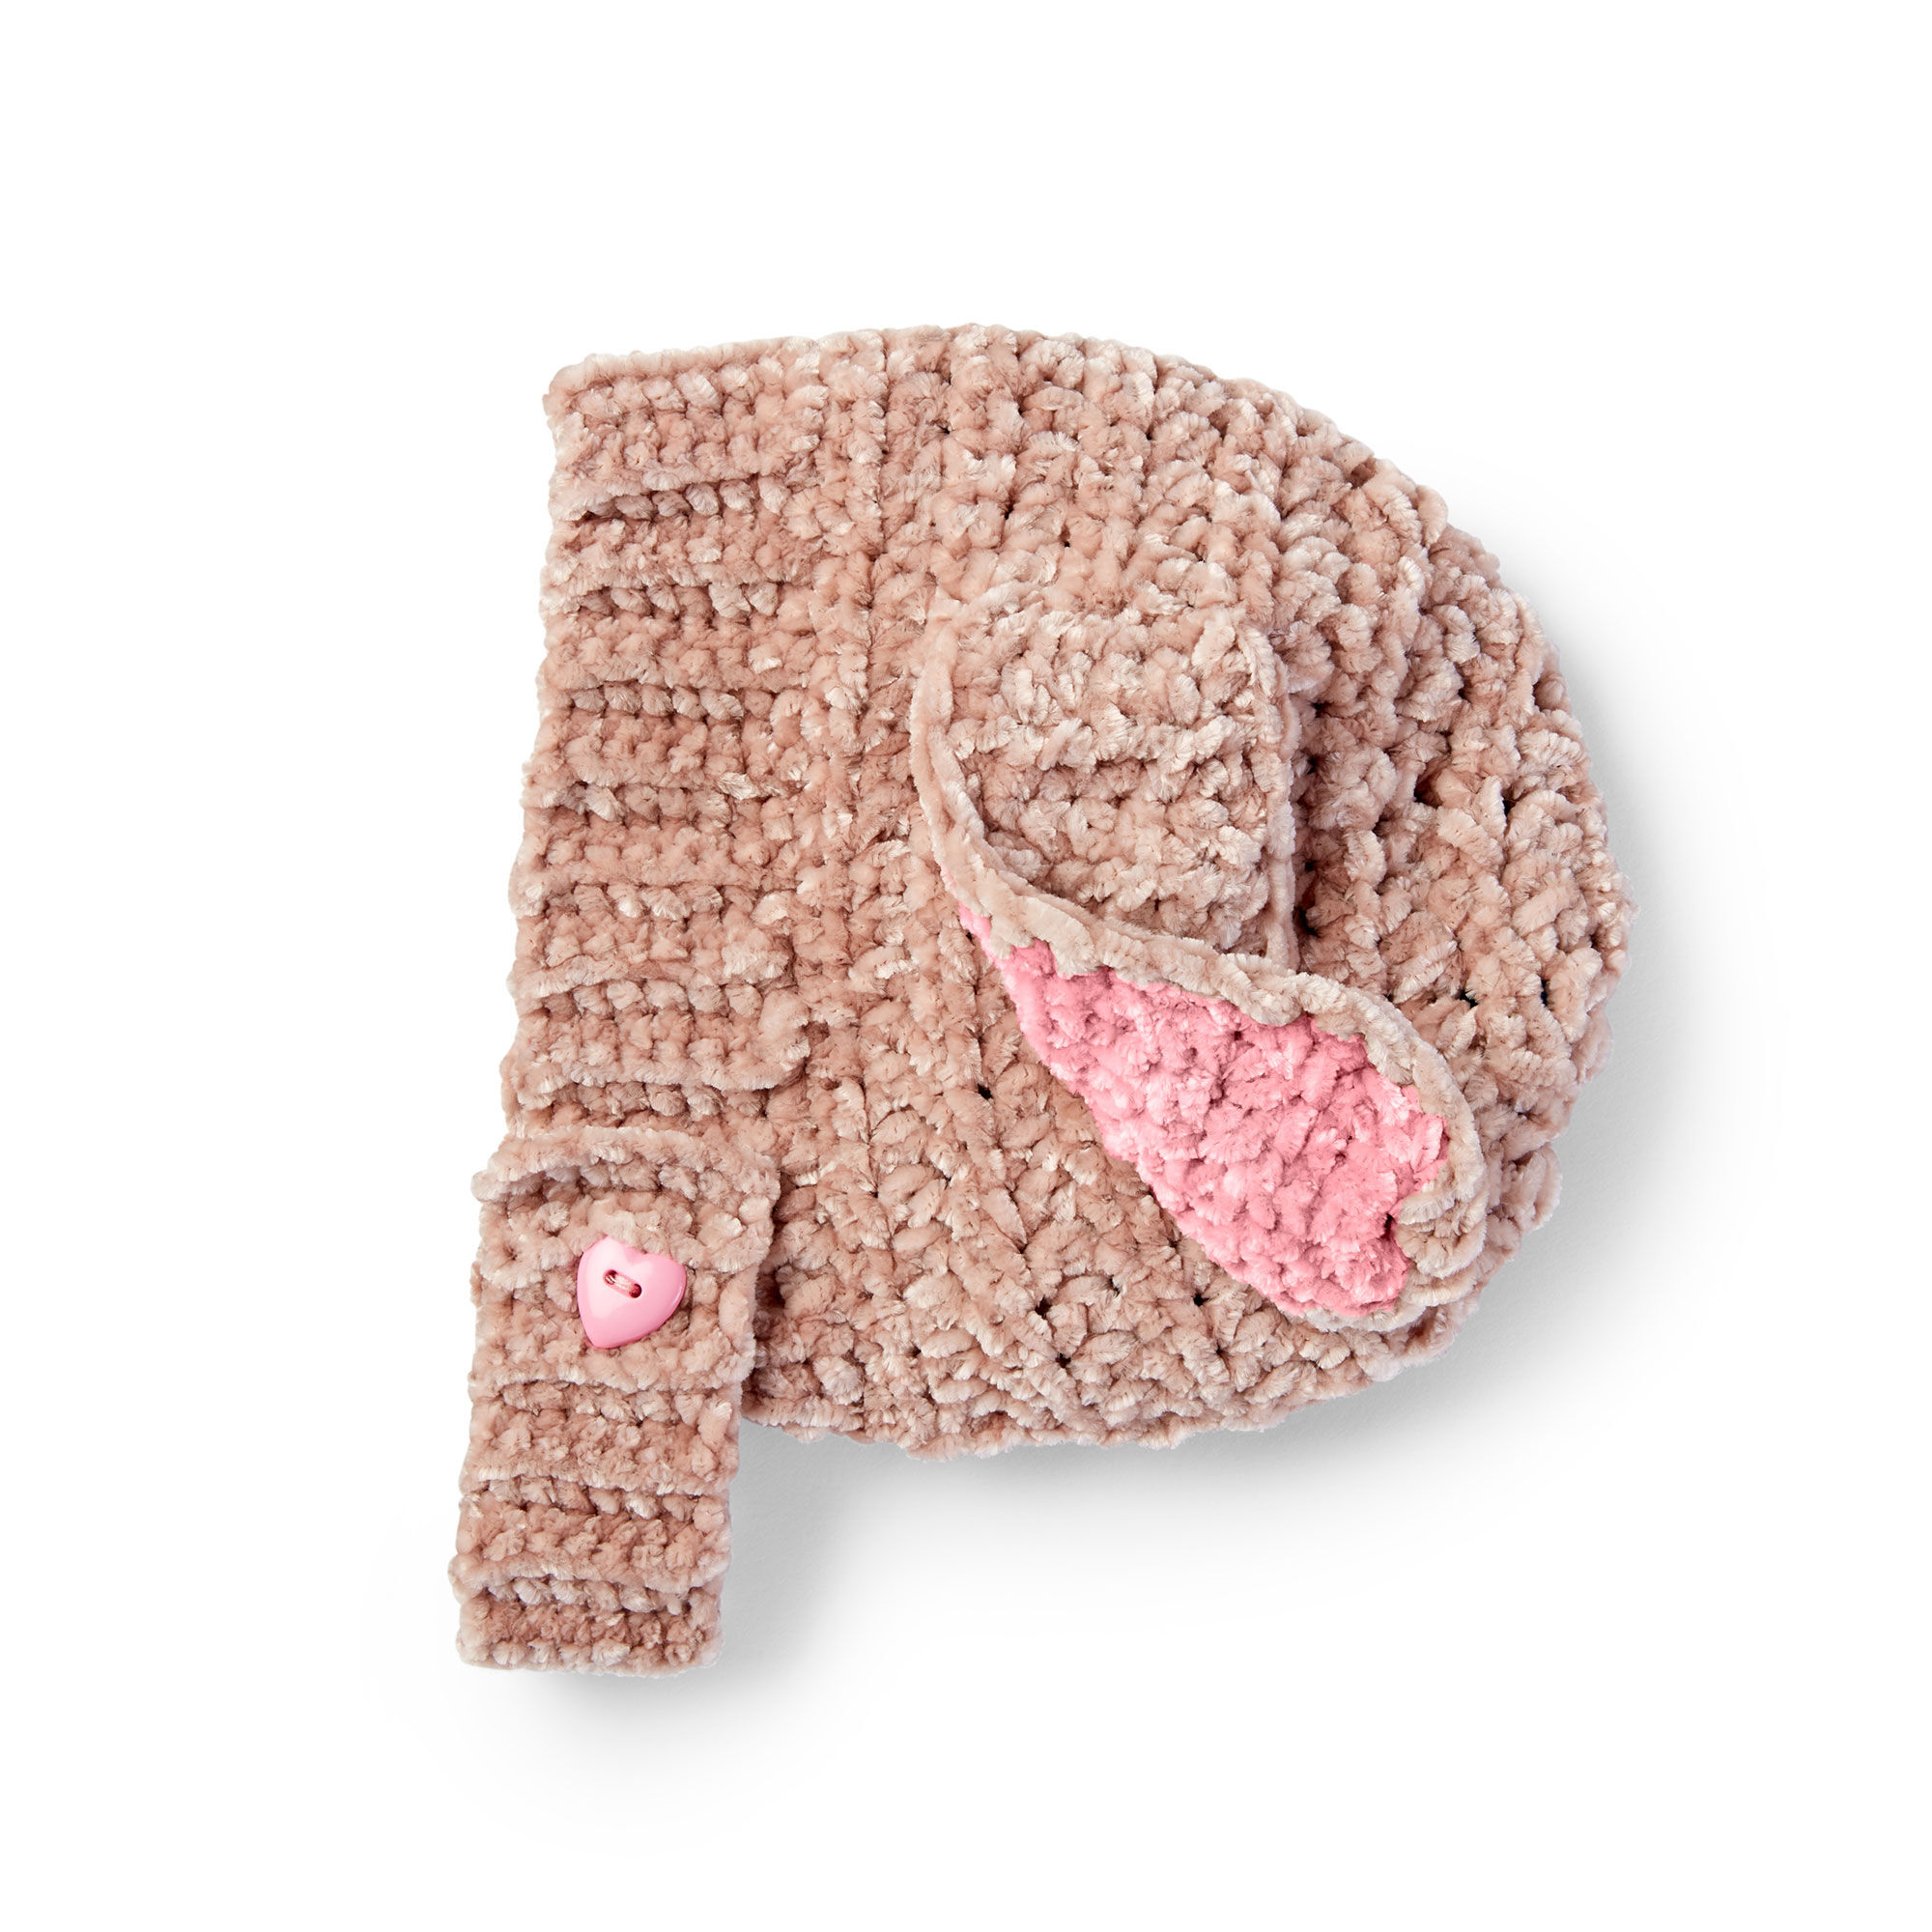 Velvet Bunny Amigurumi Free Crochet Pattern | Crochet bunny ... | 2000x2000